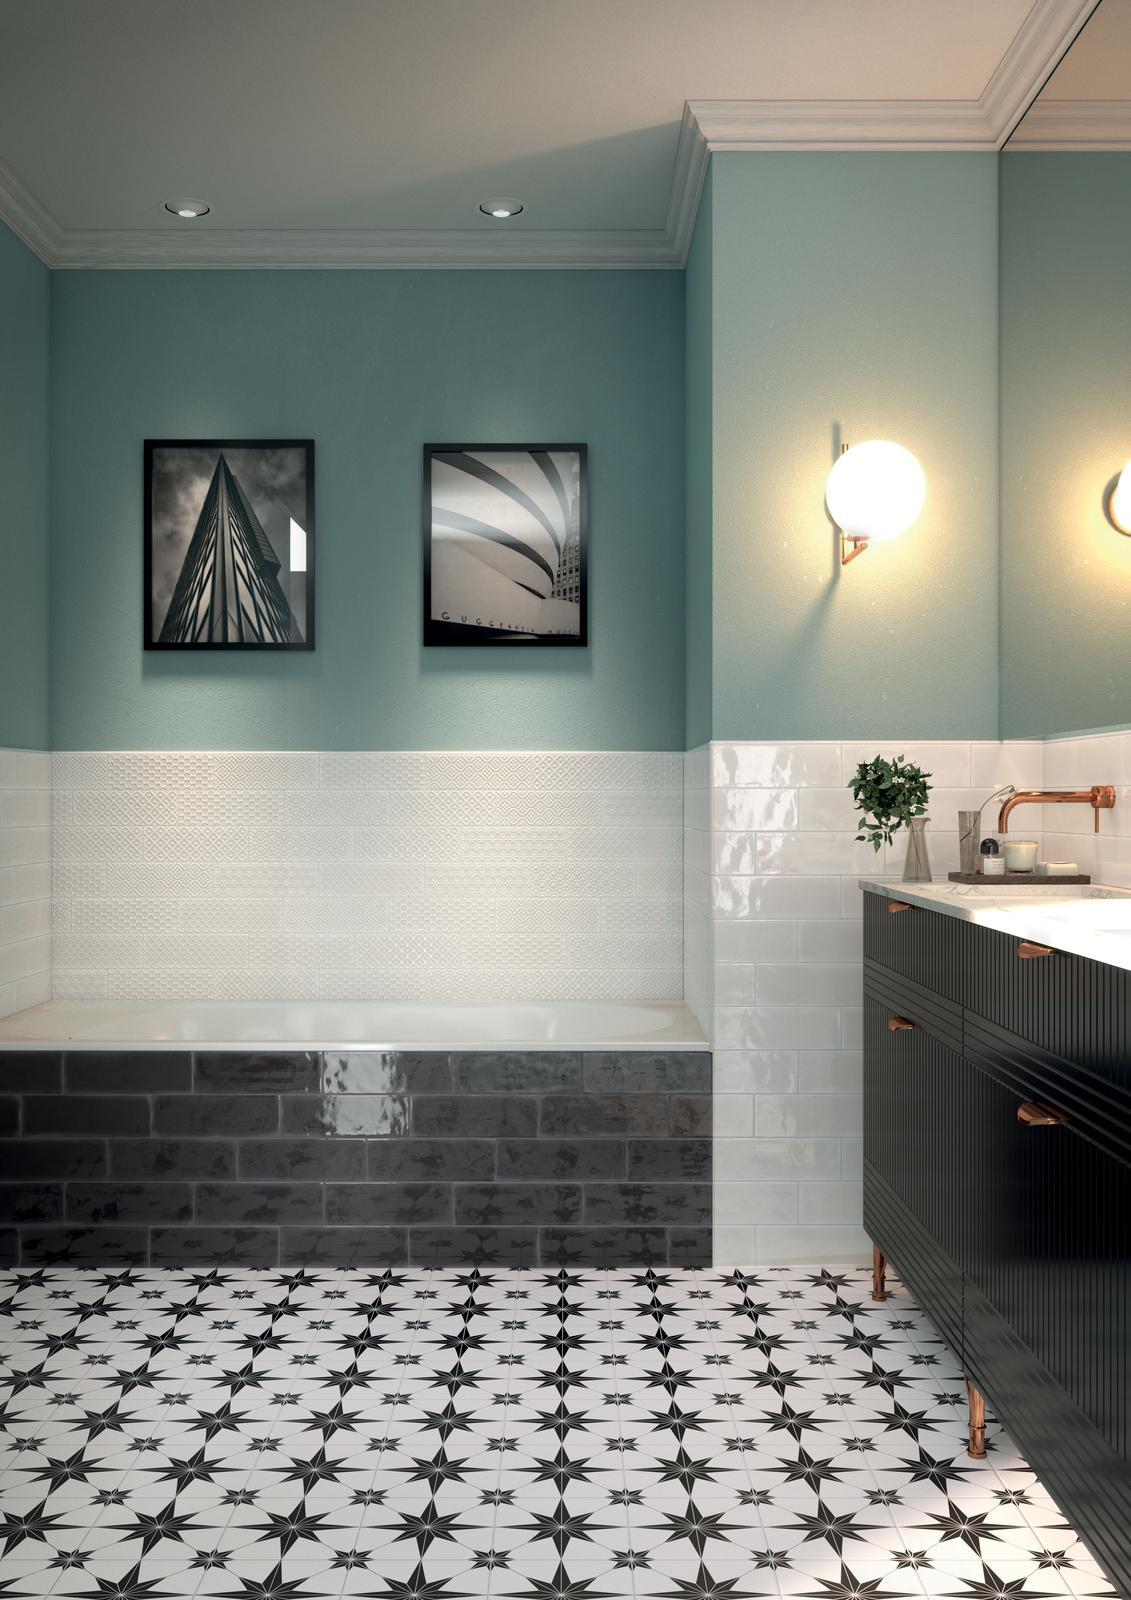 Zelená v kúpeľni - Obrázok č. 15